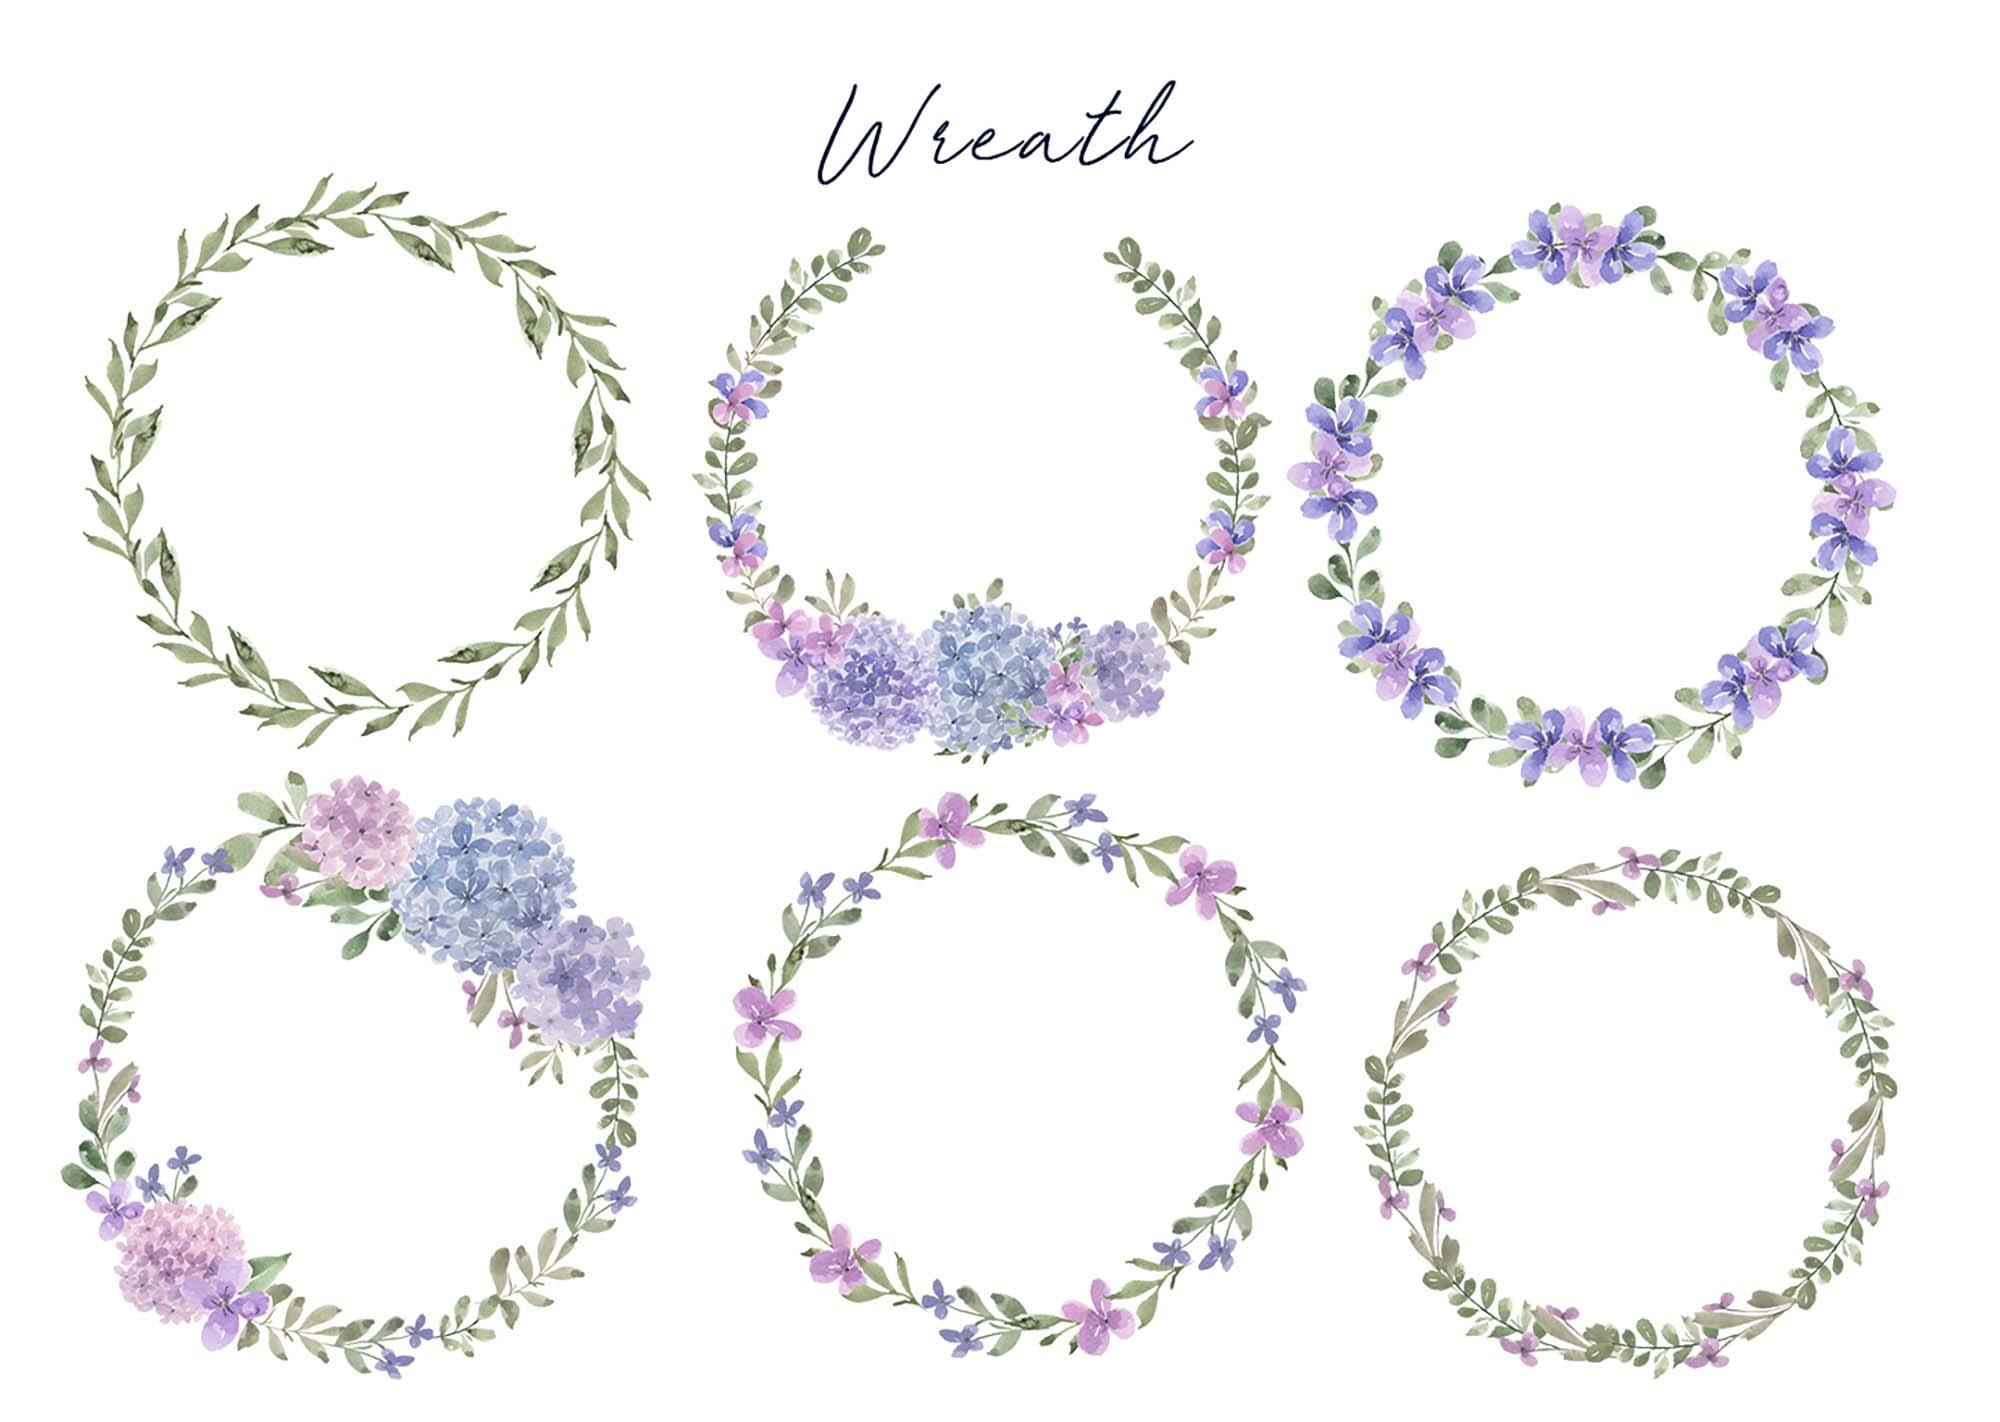 Hydrangea Watercolor Design Elements 3